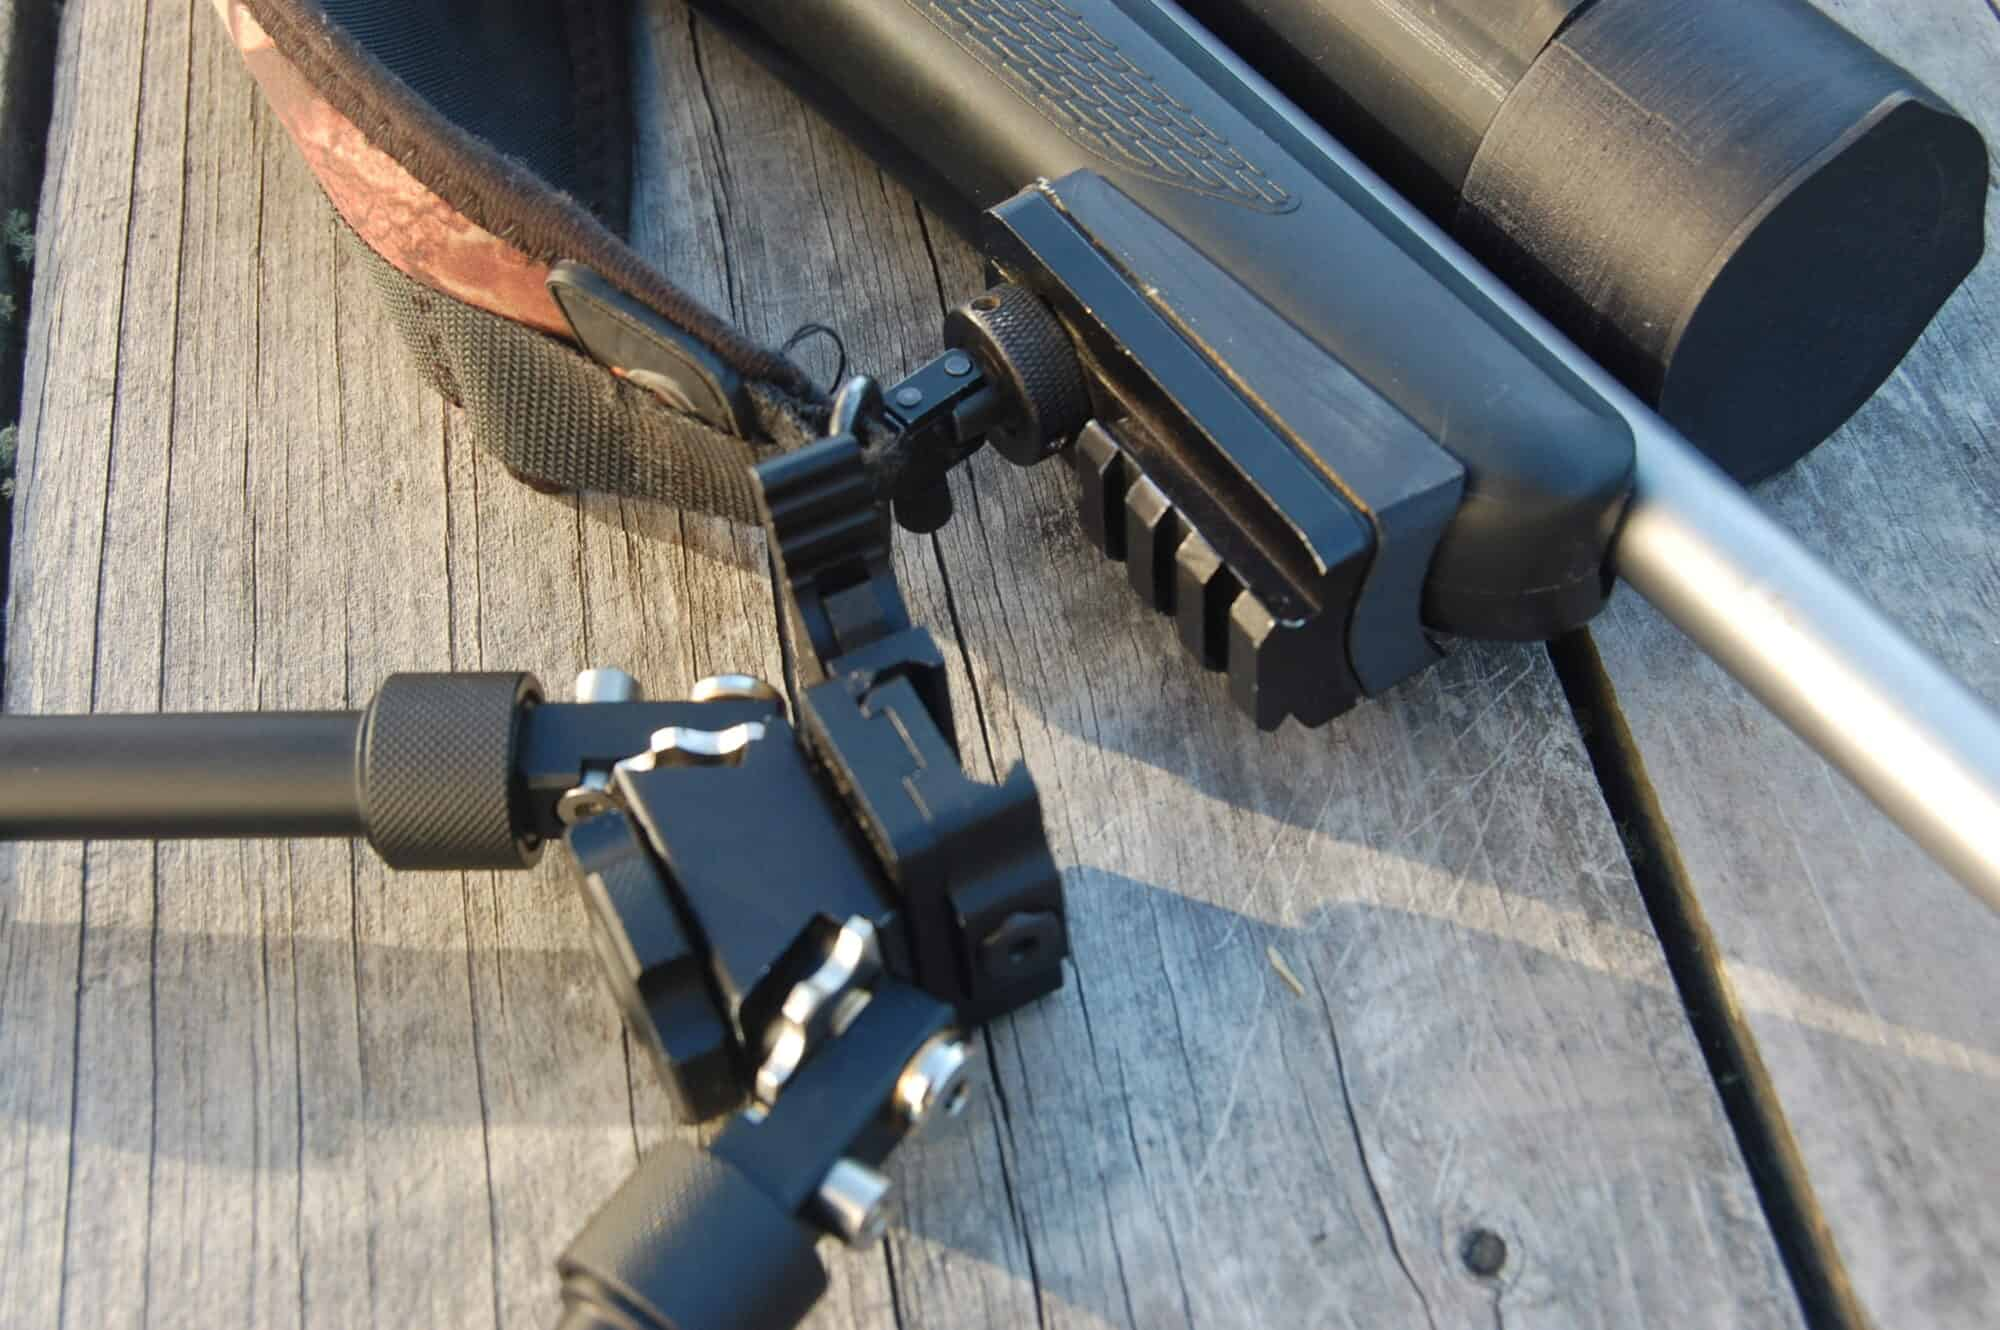 ACCU Long Range Bipod Sling Stud Picatinny style rail adapter